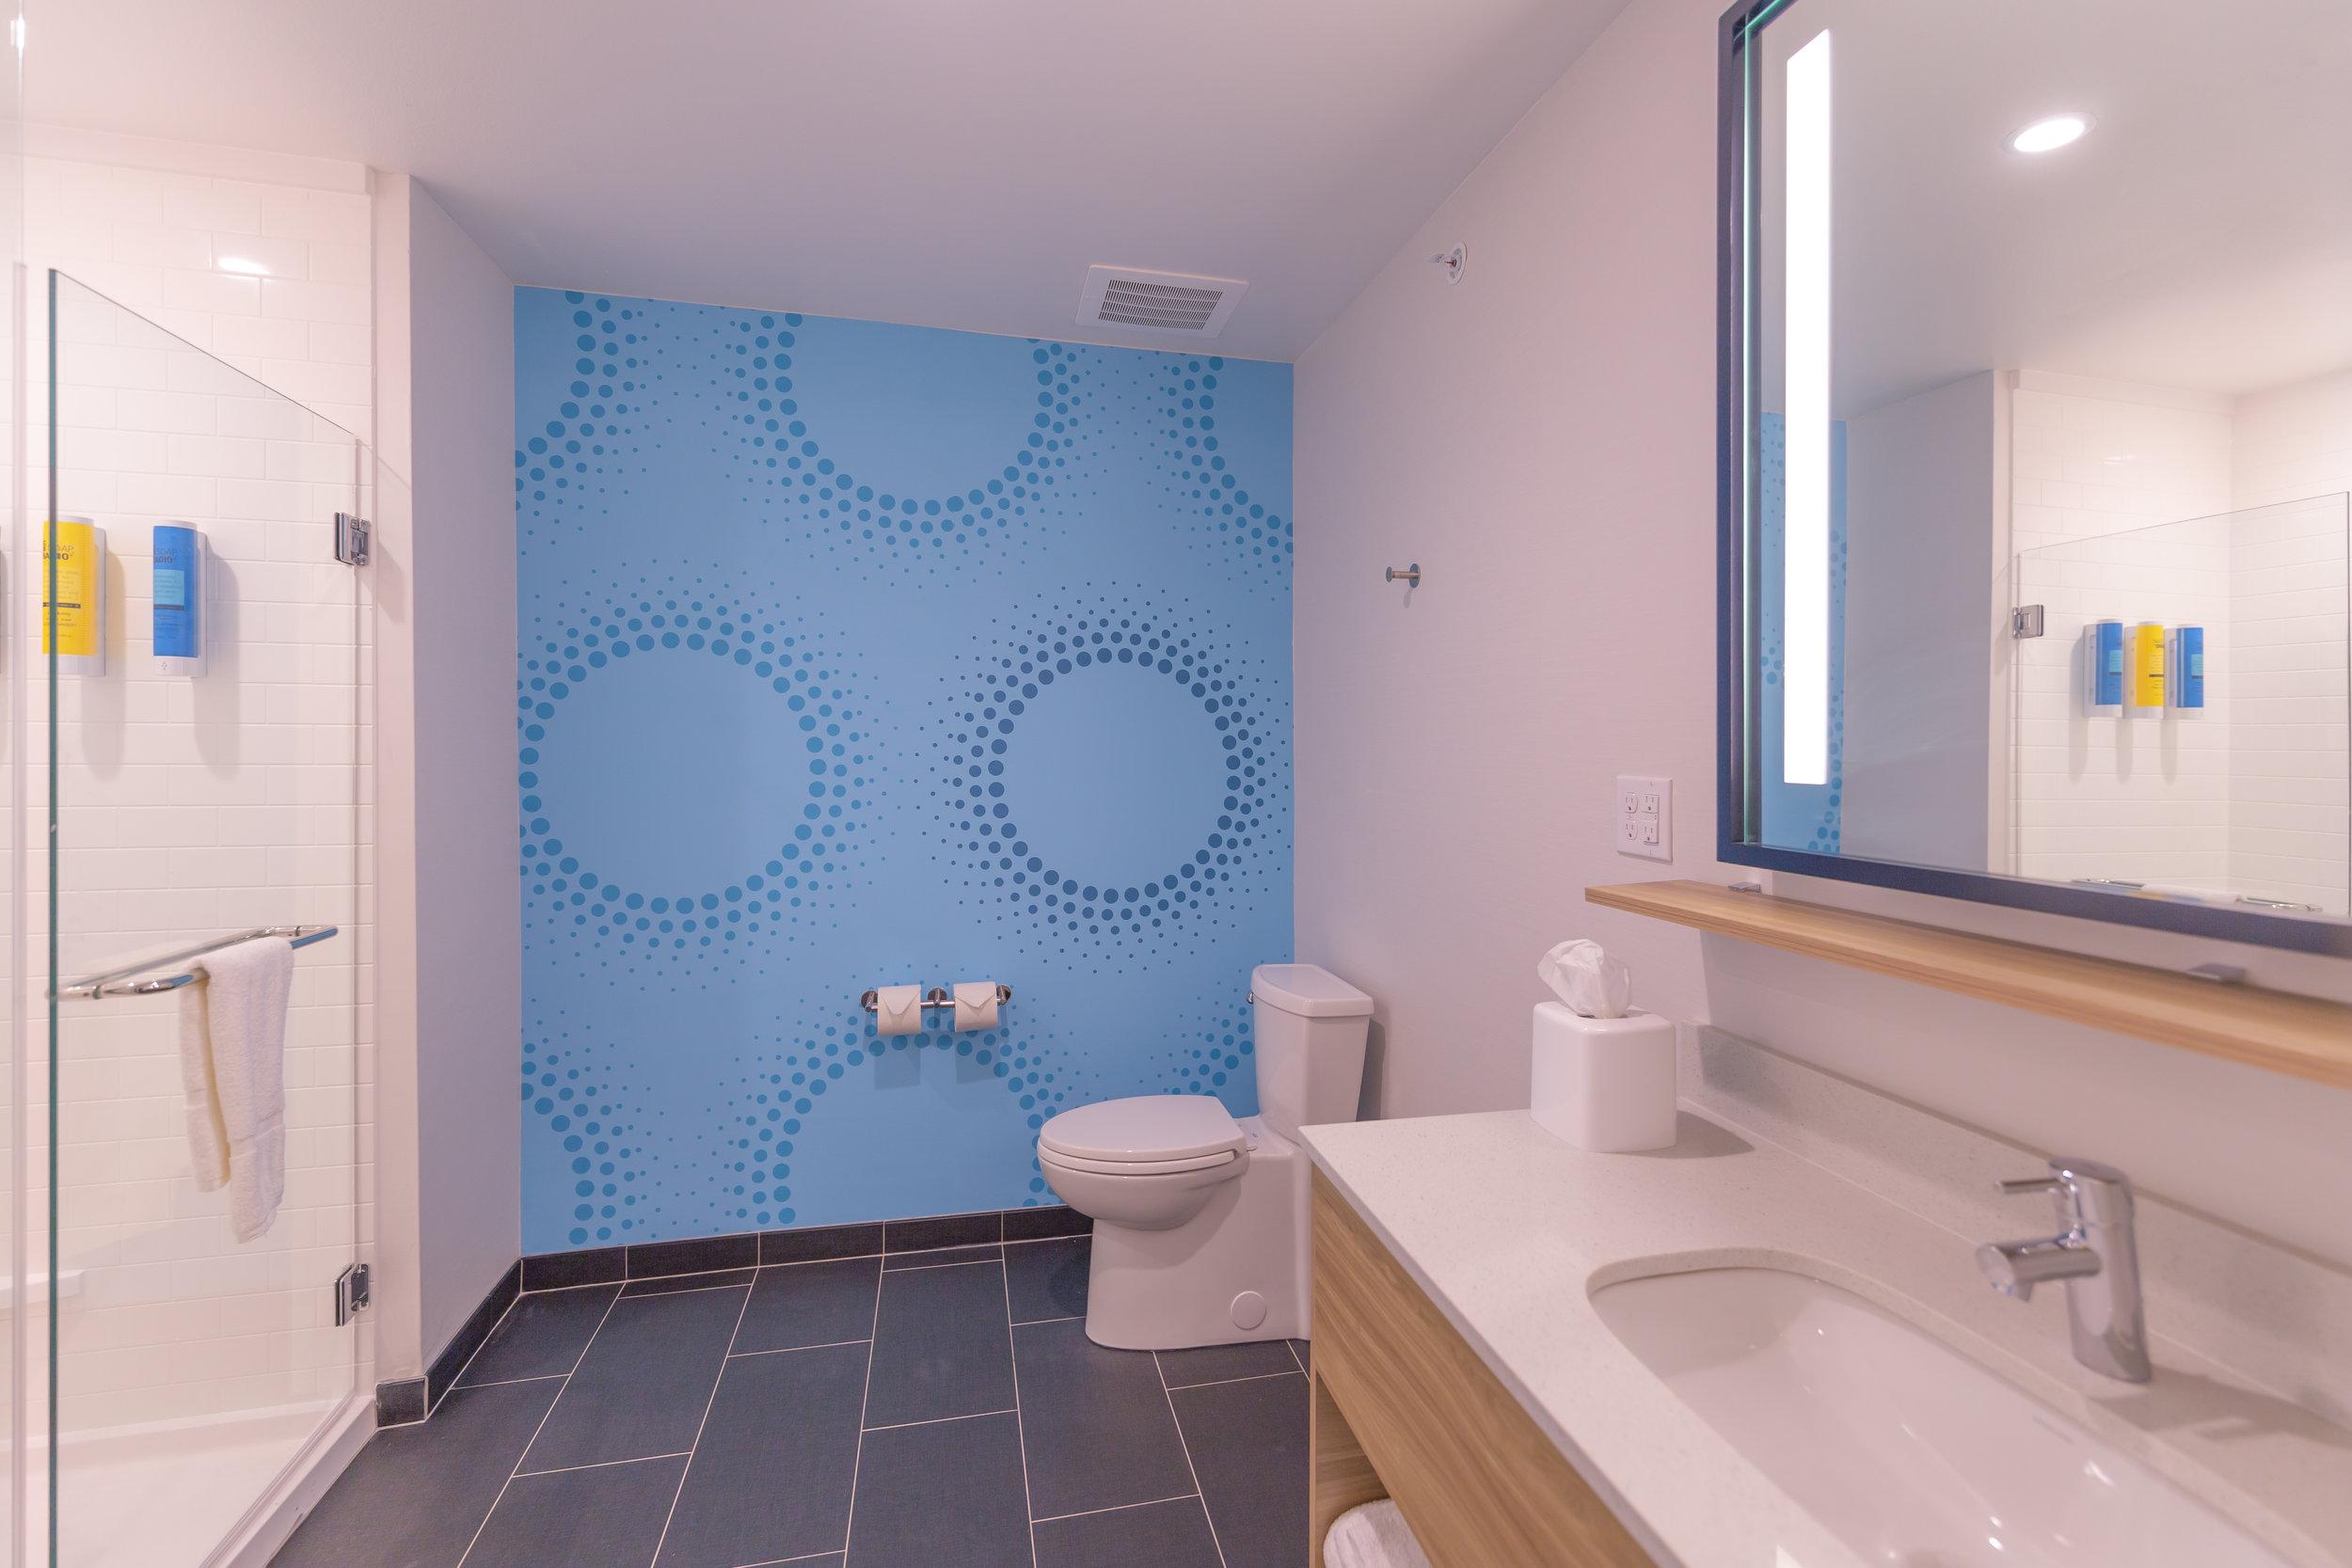 Guest bathroom in Tru by Hilton in Brookfield, WI